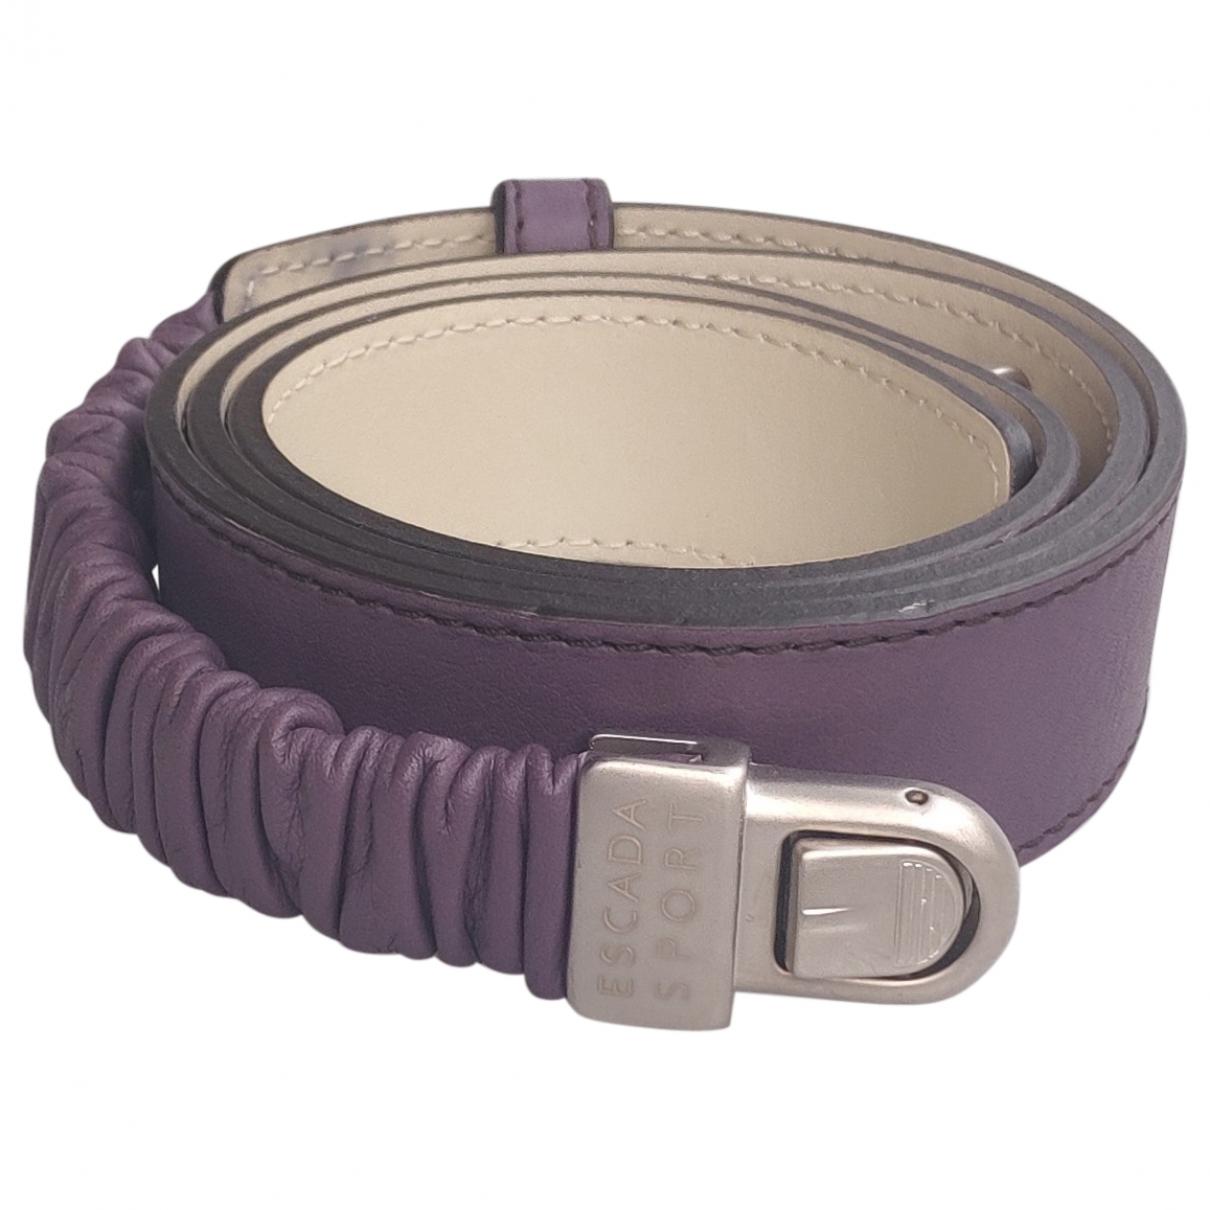 Escada \N Purple Leather belt for Women M International